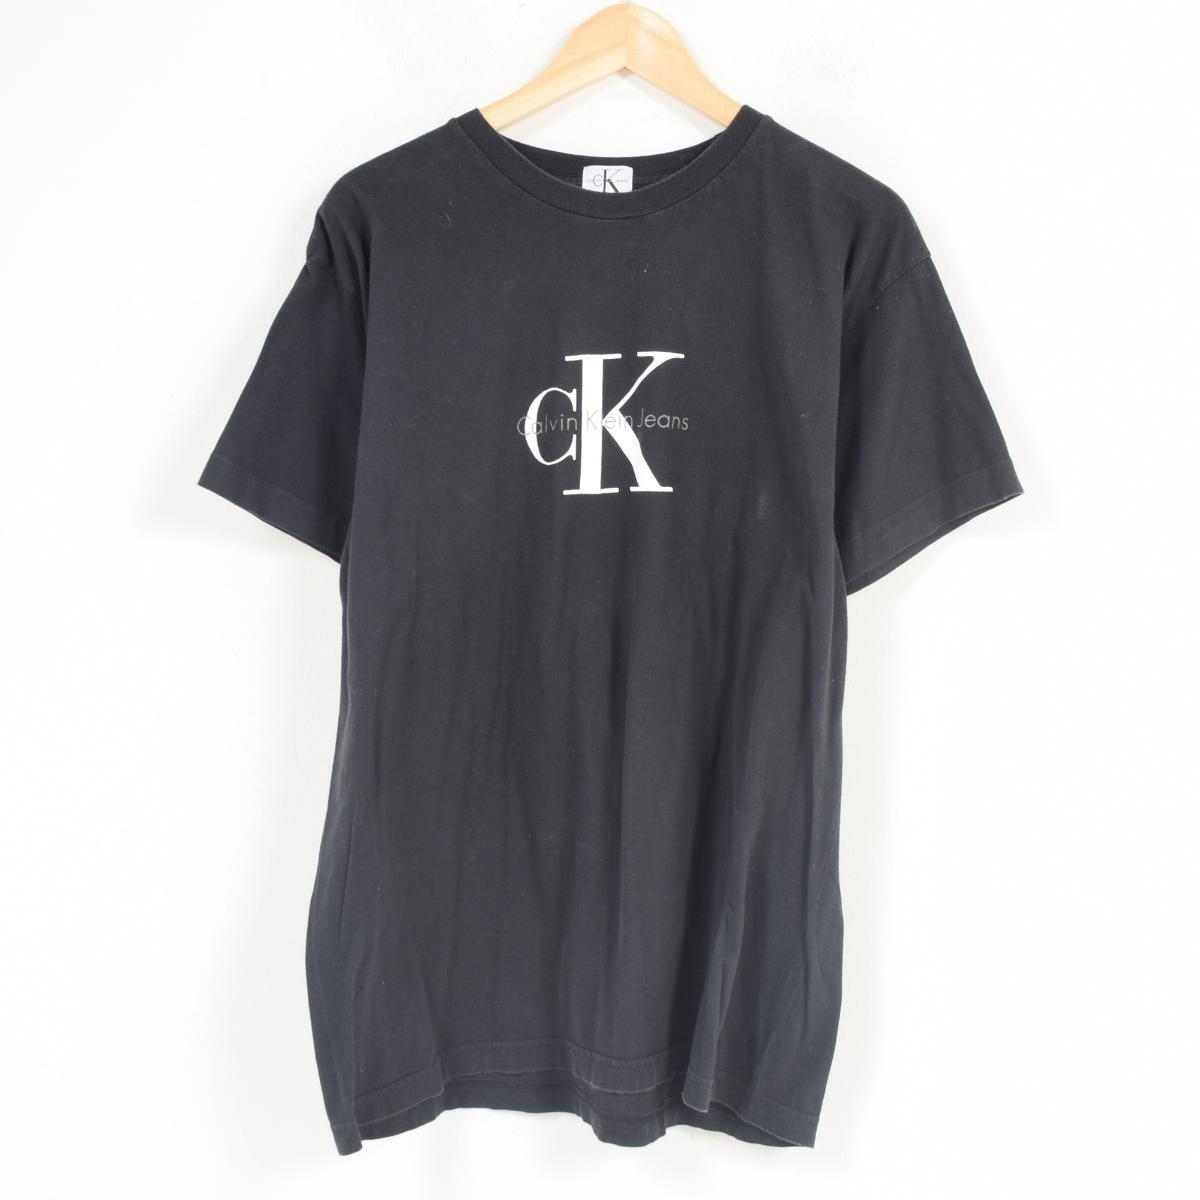 de8b43ba9 90s Calvin Klein Calvin klein JEANS logo print T-shirt men L /war0857 ...